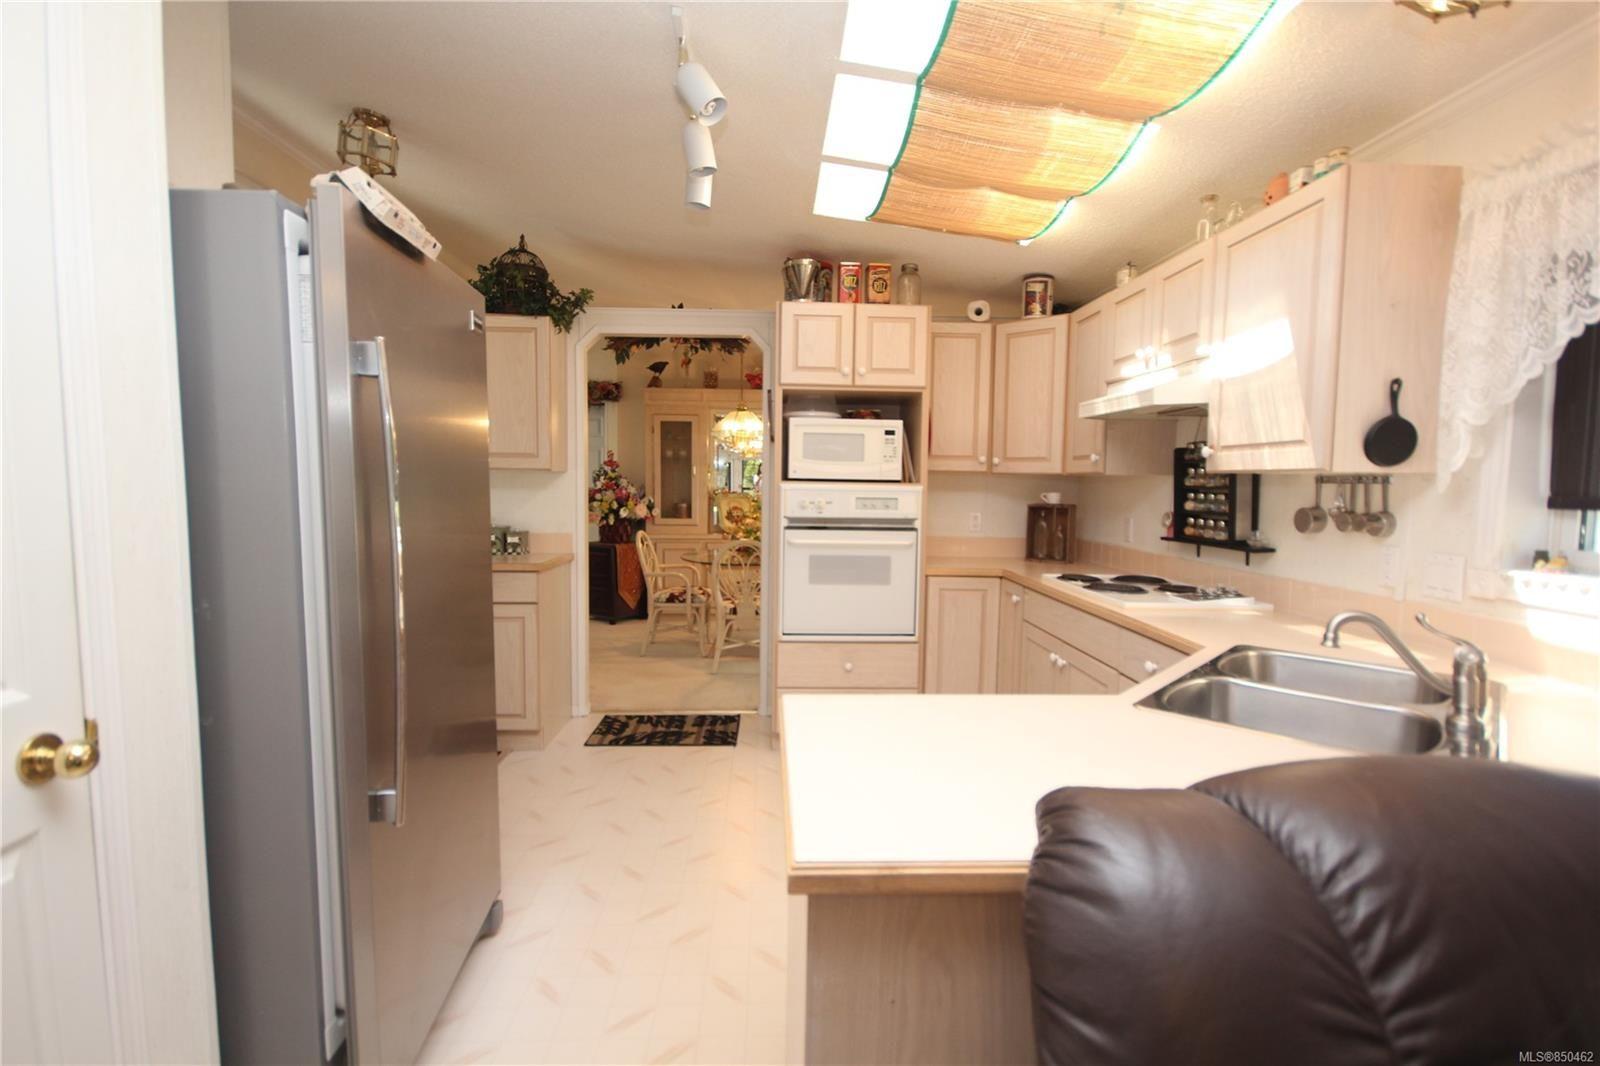 Photo 10: Photos: 31 2357 Sooke River Rd in : Sk Sooke River Manufactured Home for sale (Sooke)  : MLS®# 850462